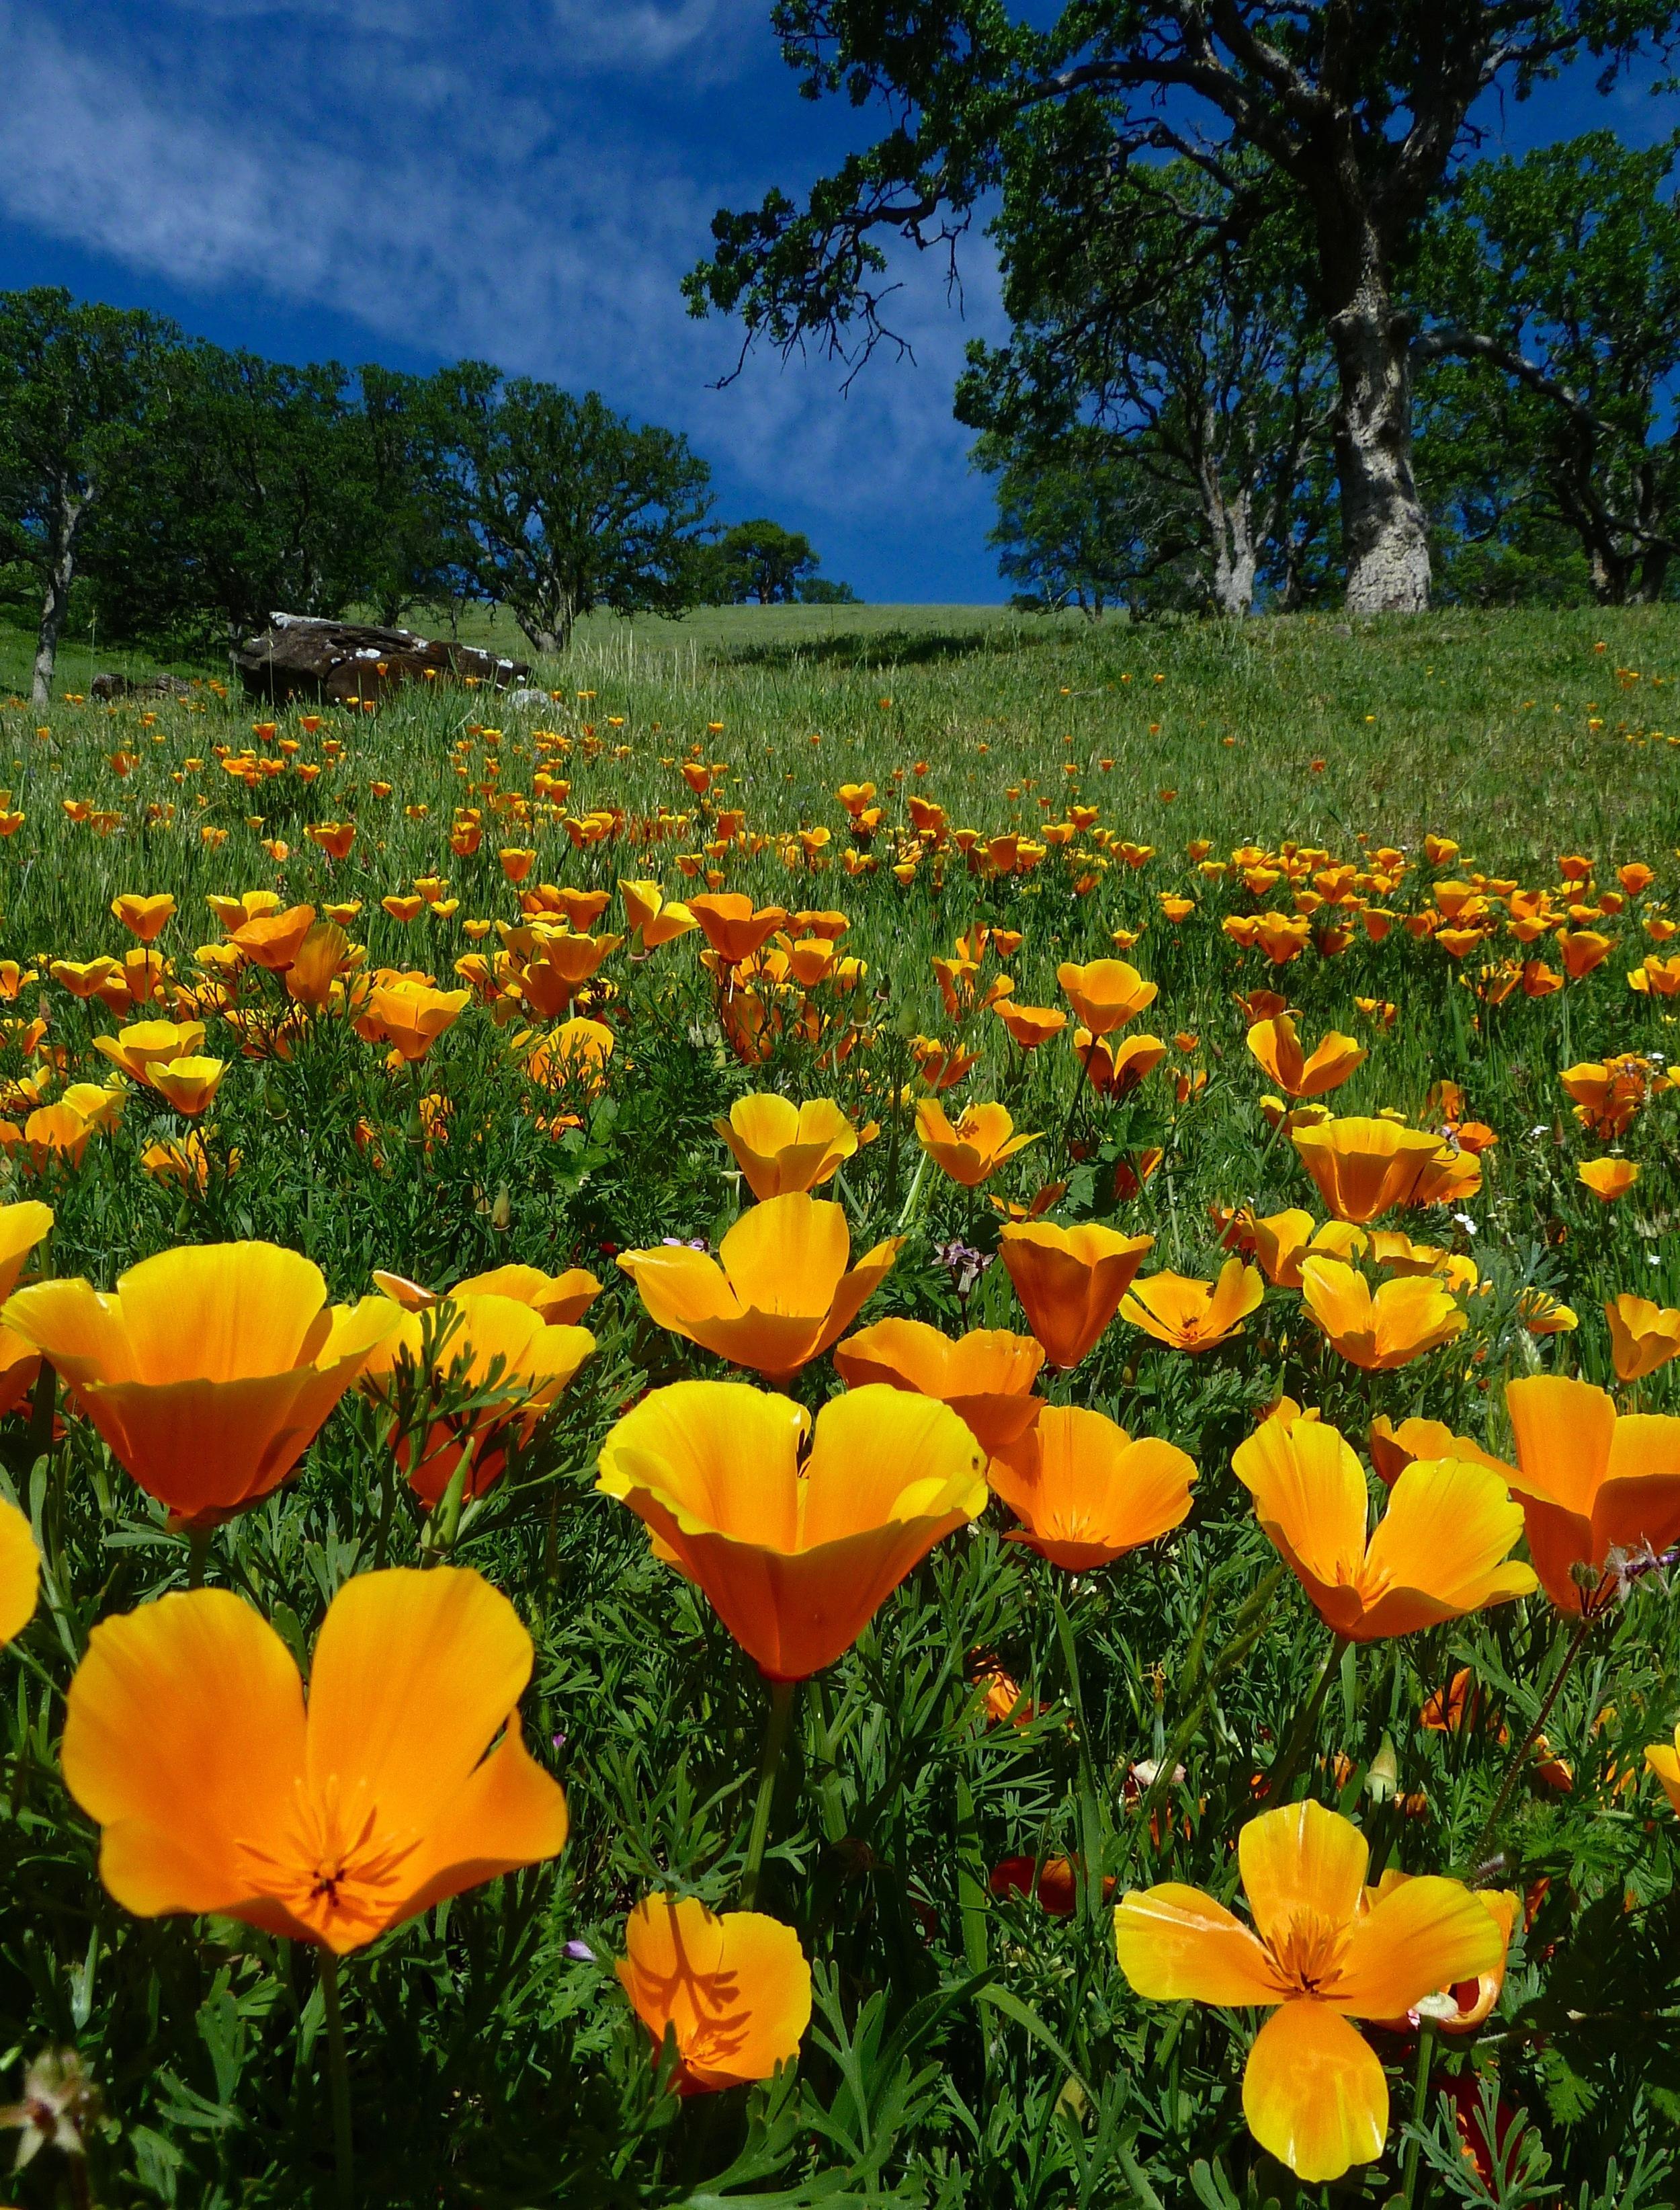 California orange poppies, Round Valley Regional Preserve.